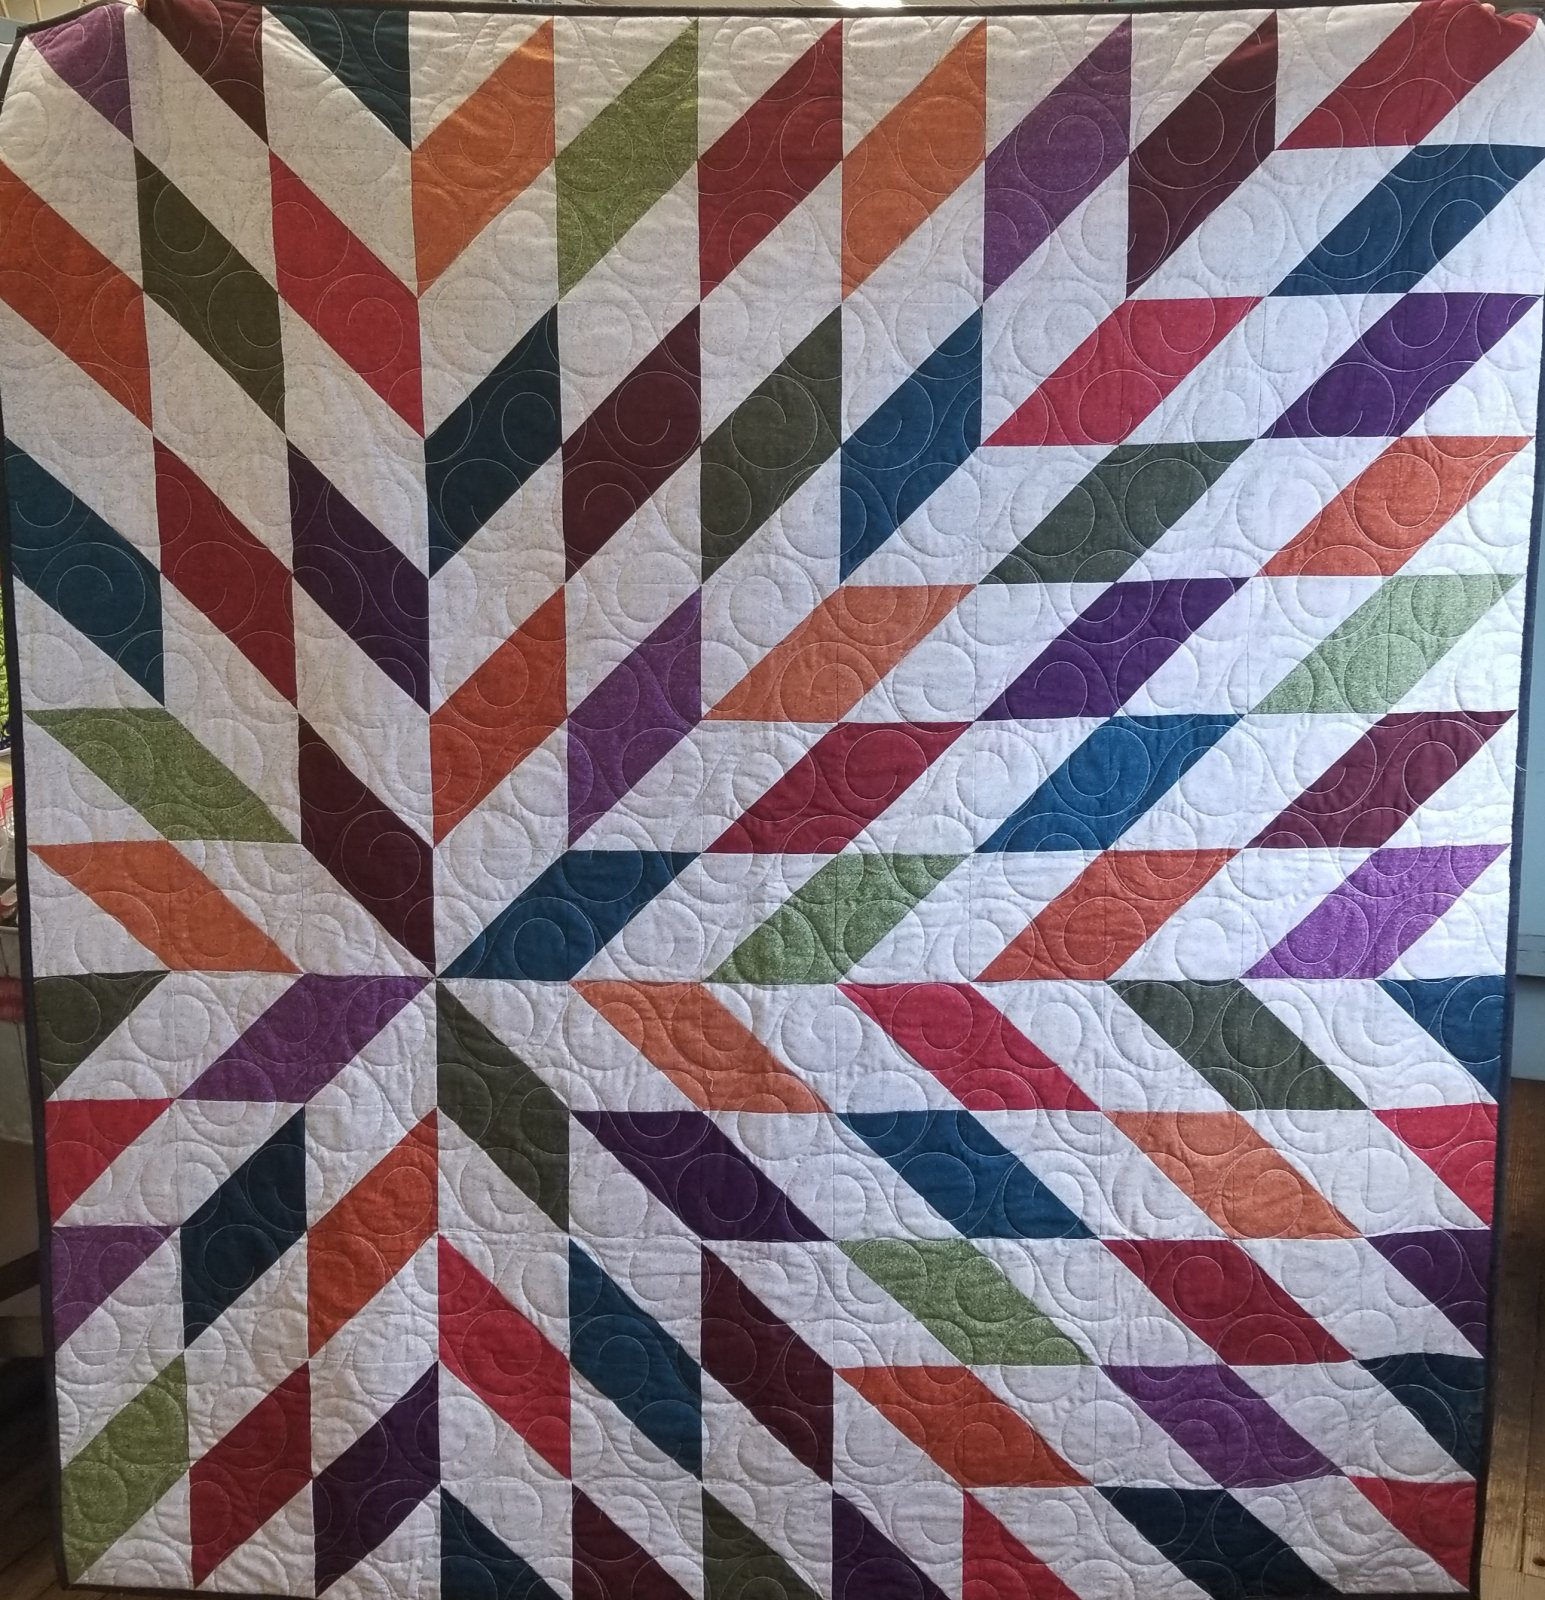 Winter Wool Solar Flare Quilt Kit